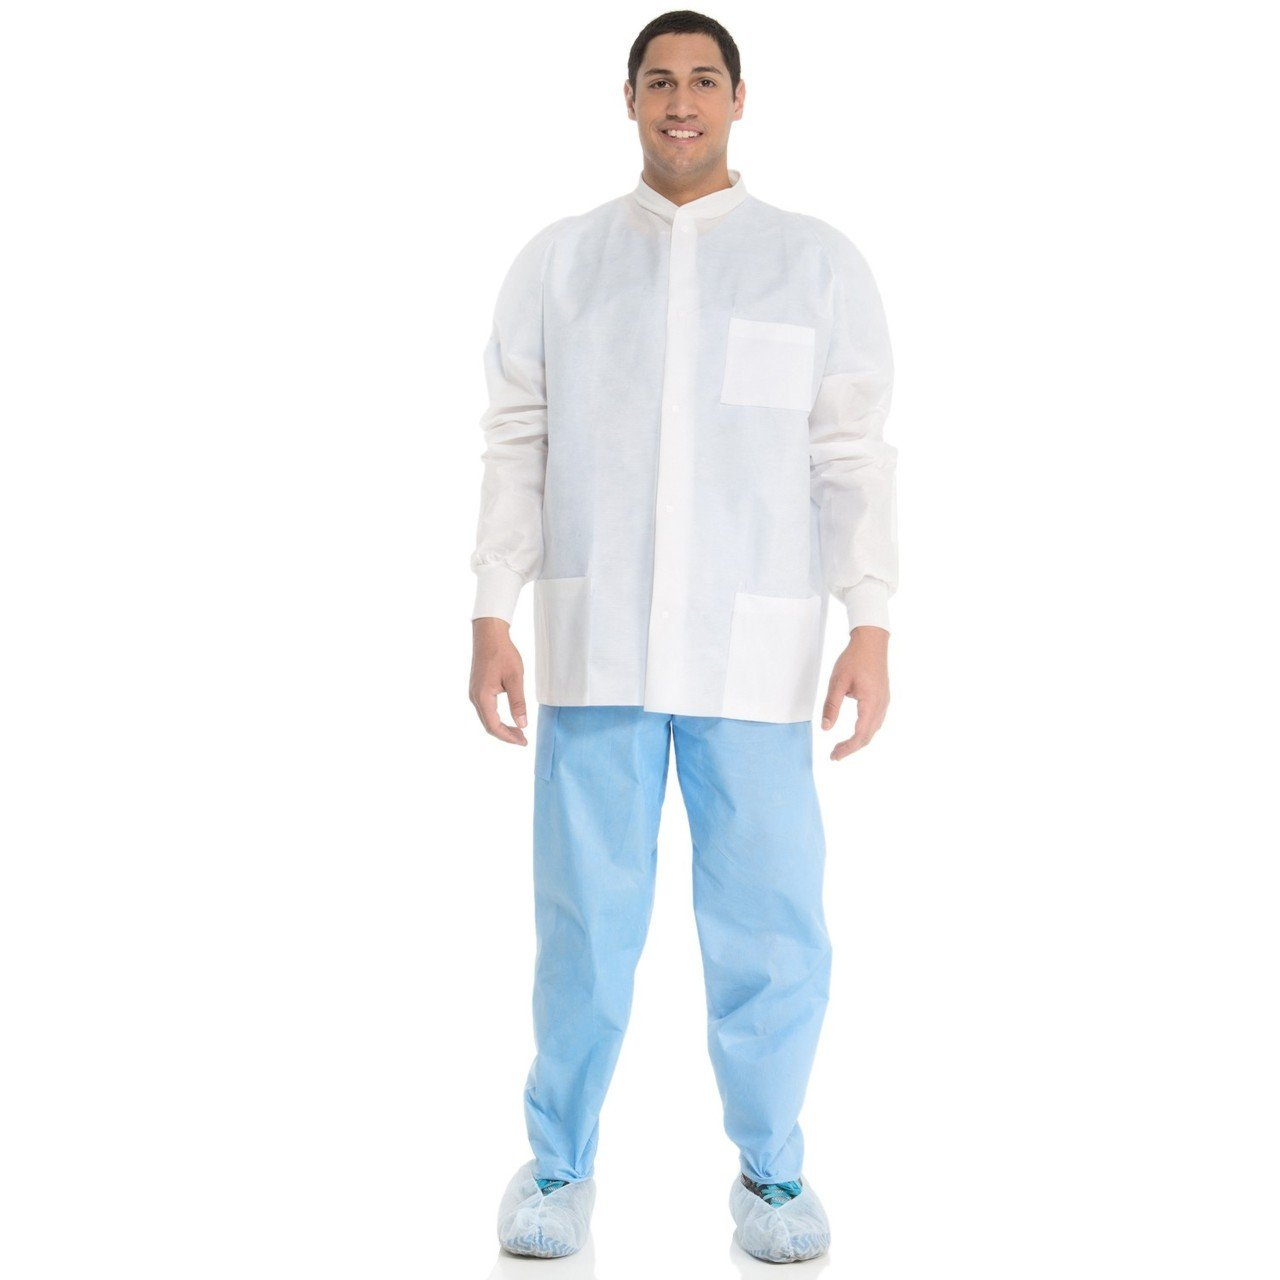 Kimberly Clark Universal precautions Lab Jacket - White -Large (68.24.75cm x 77.5cm x 49.5cm)- 25 per Case by Kimberly-Clark